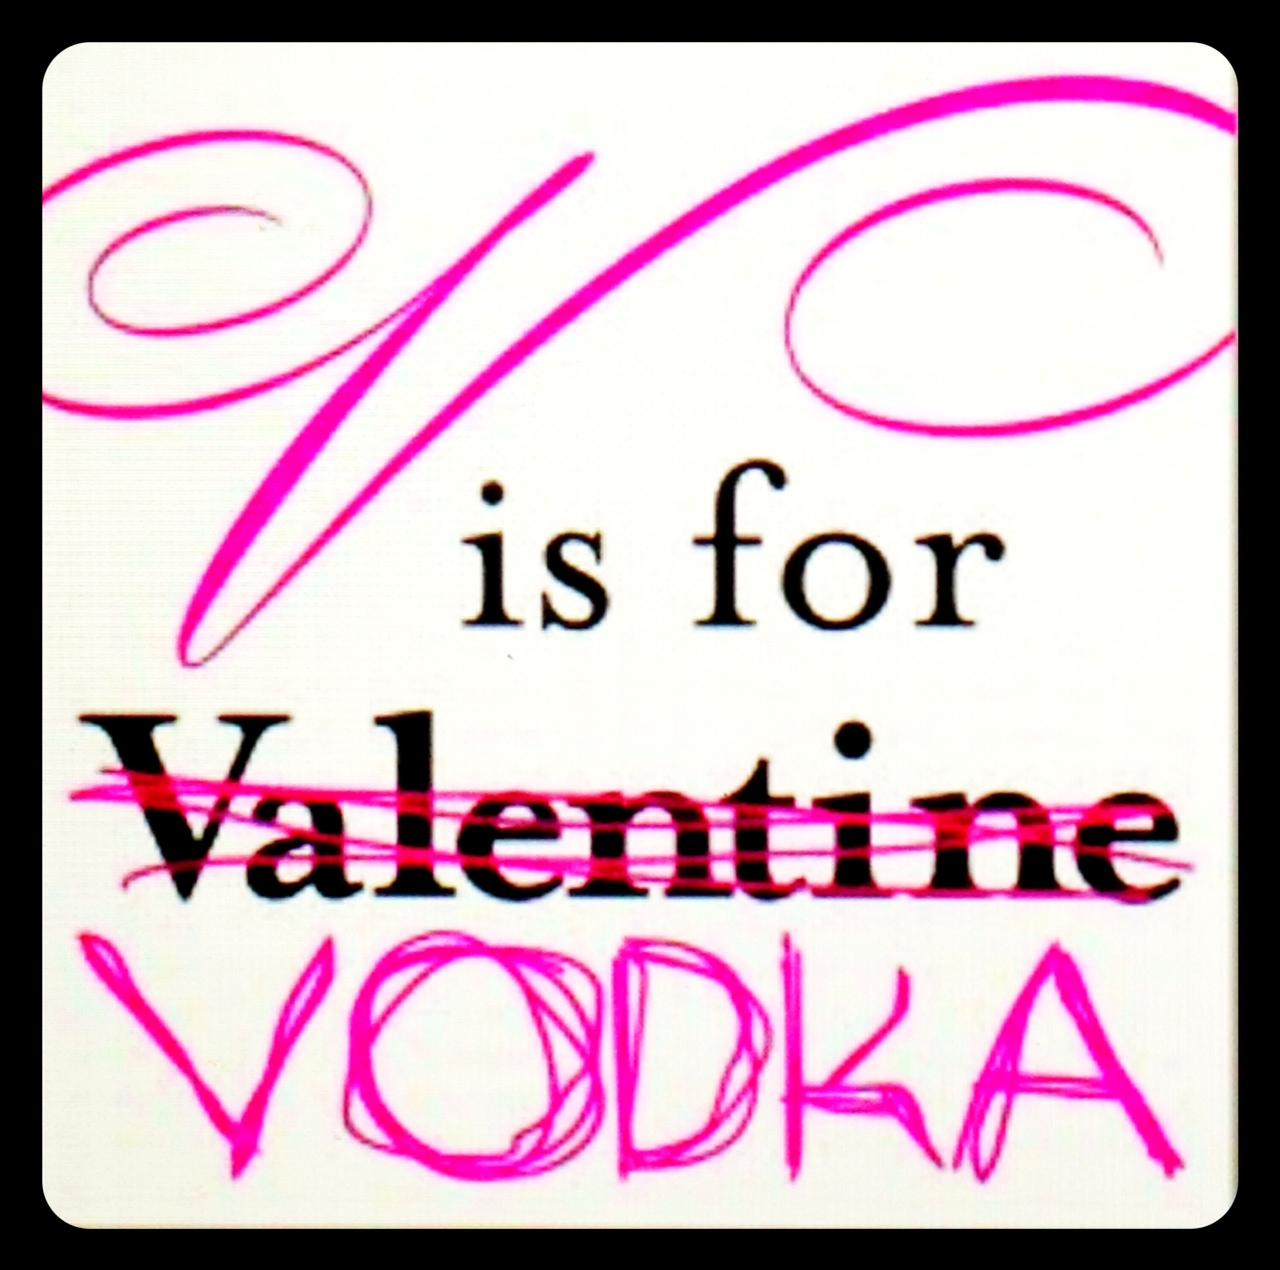 v is for vodka - Valentines Vodka